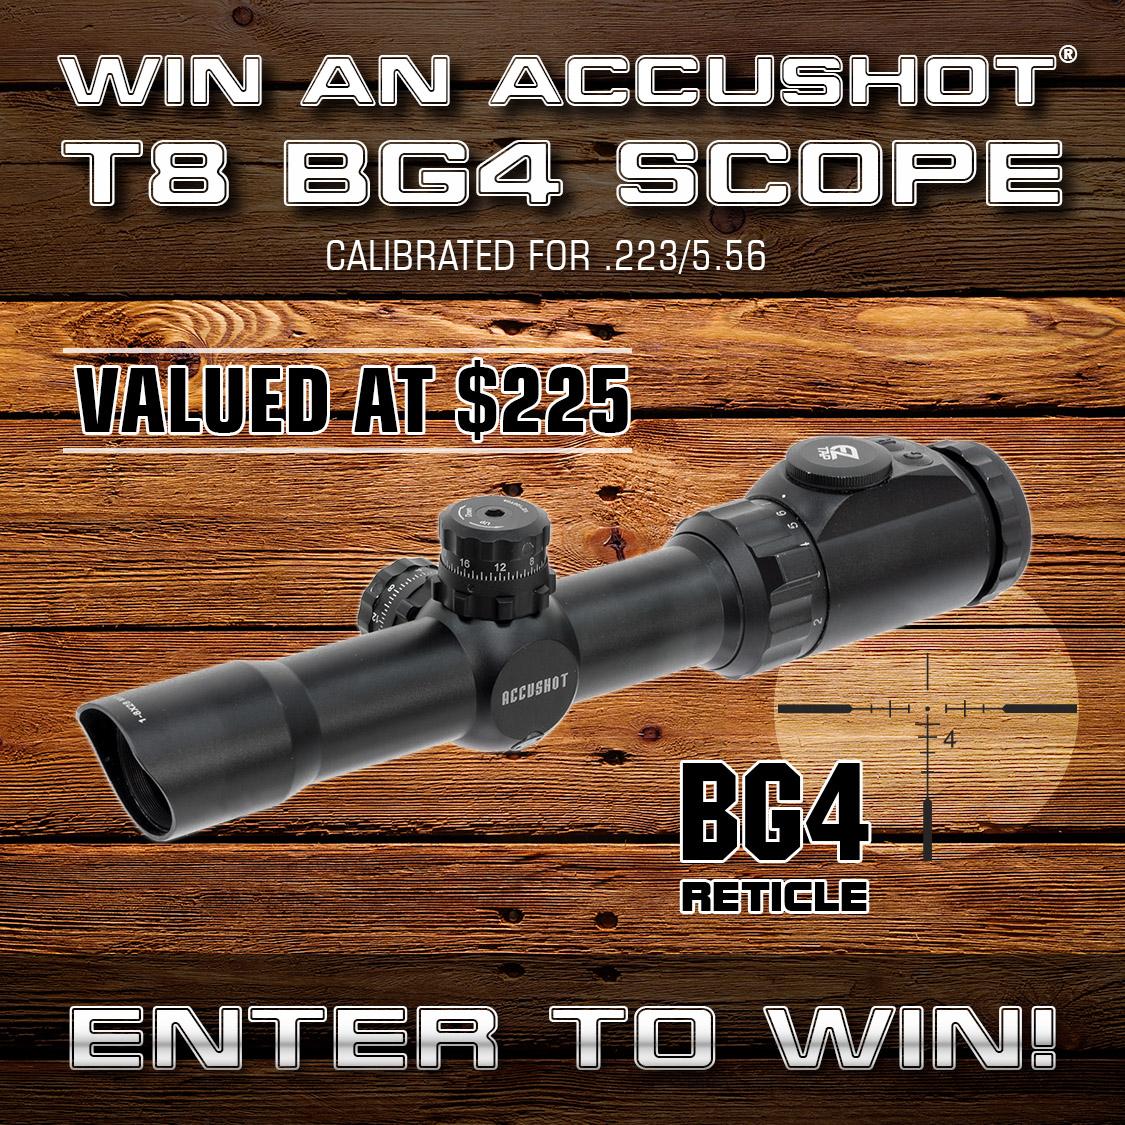 Accushot T8 BG4 Scope Giveaway (3 Winners) Giveaway Image